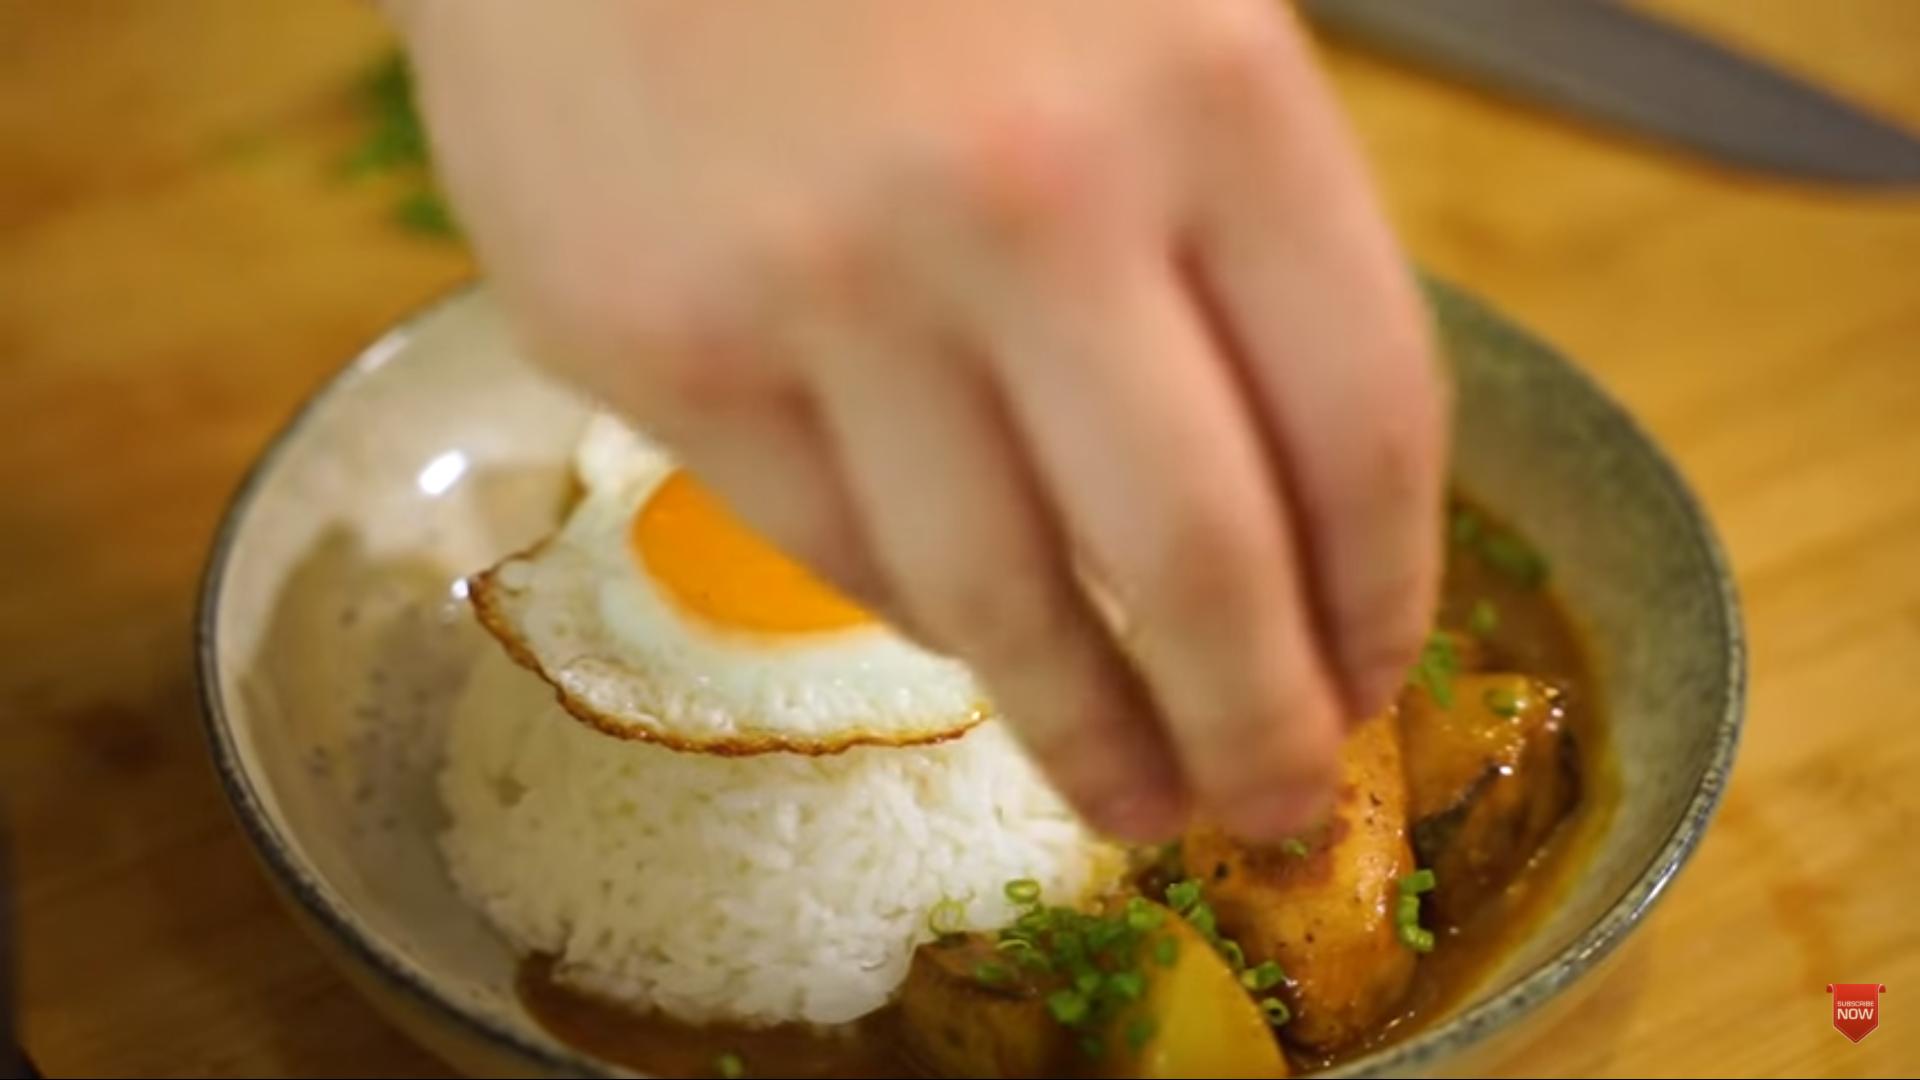 Masak Kari Jepang Ala Resto Ternyata Mudah, Ini Tips Anti Gagal!